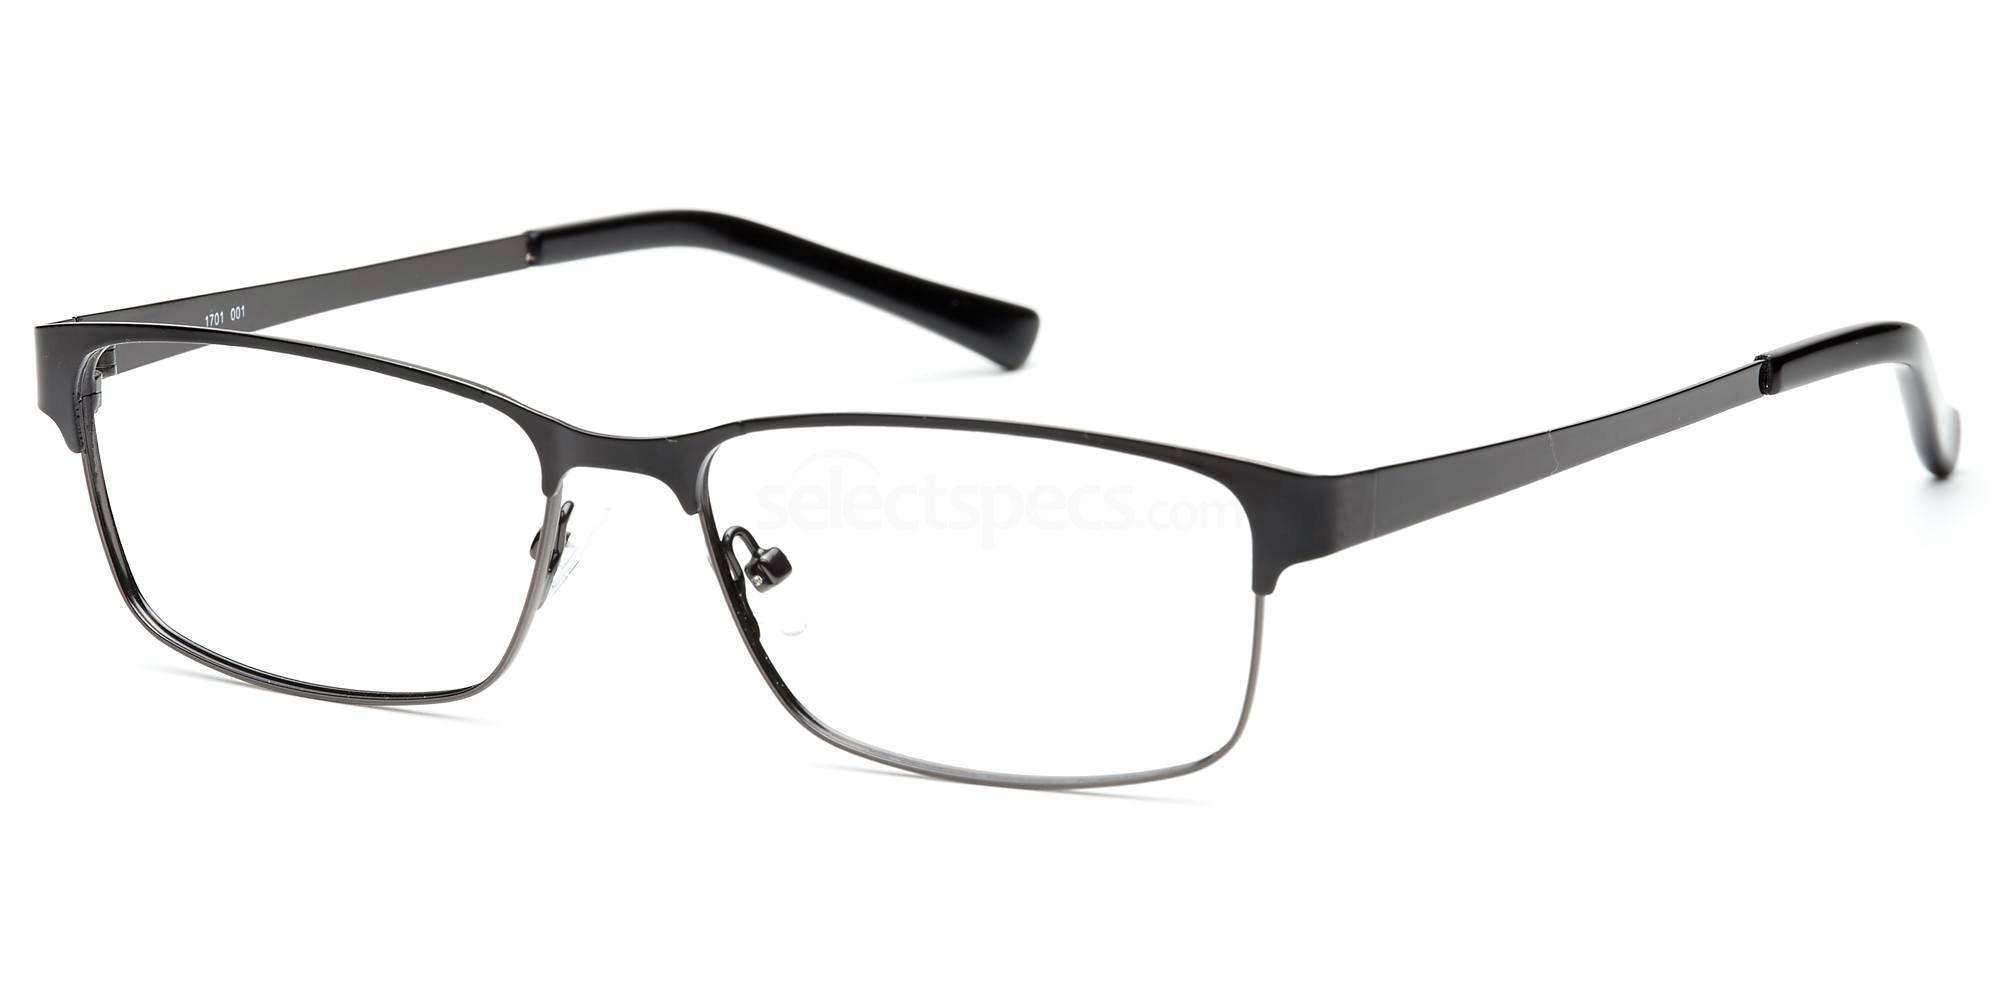 C1 FLX1701 Glasses, Flextra